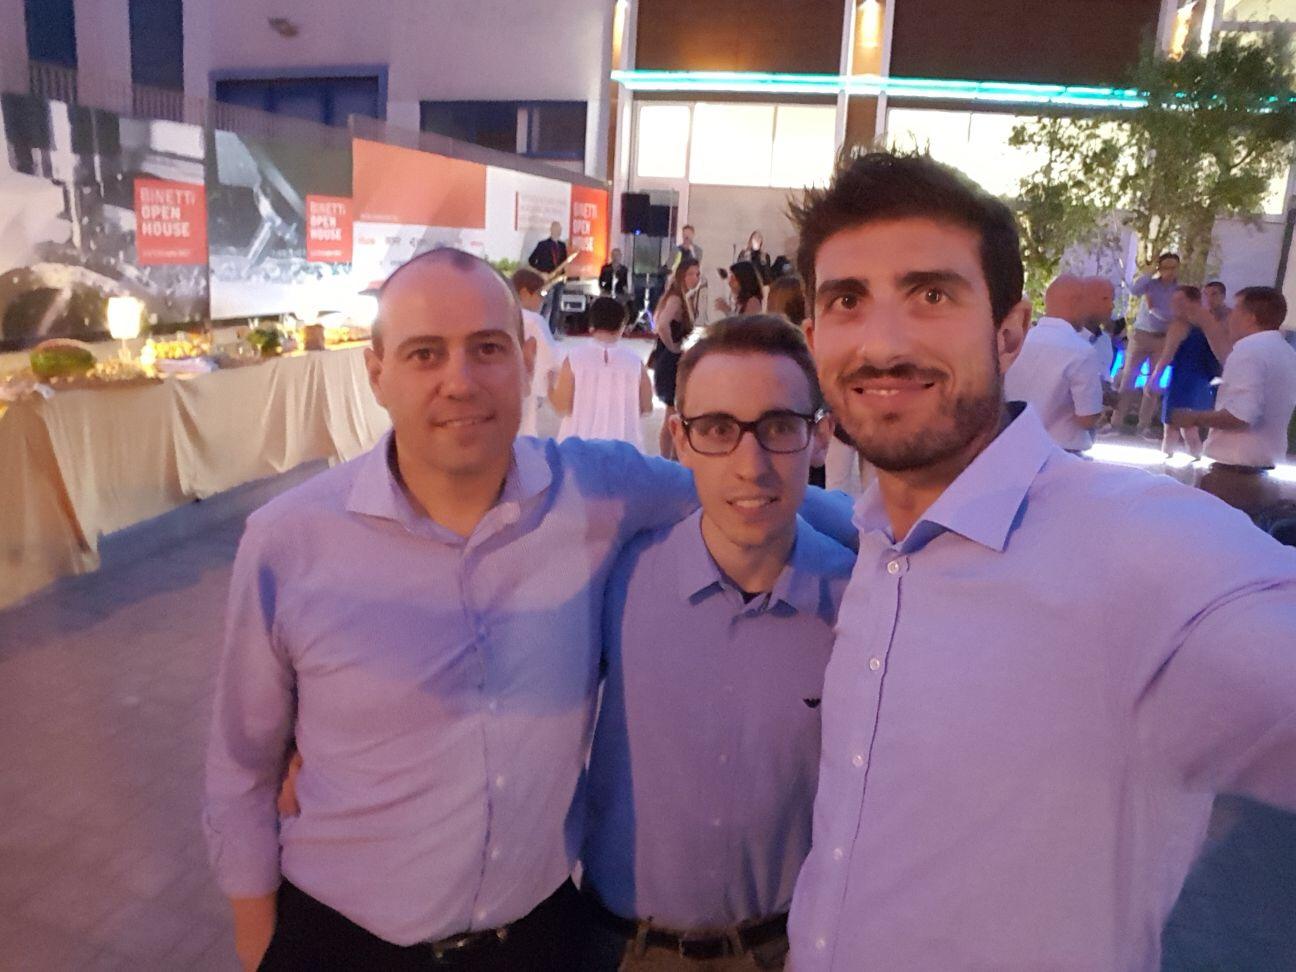 Paolo Pradini, Fabrizio Prandini, Riccardo Siracusa